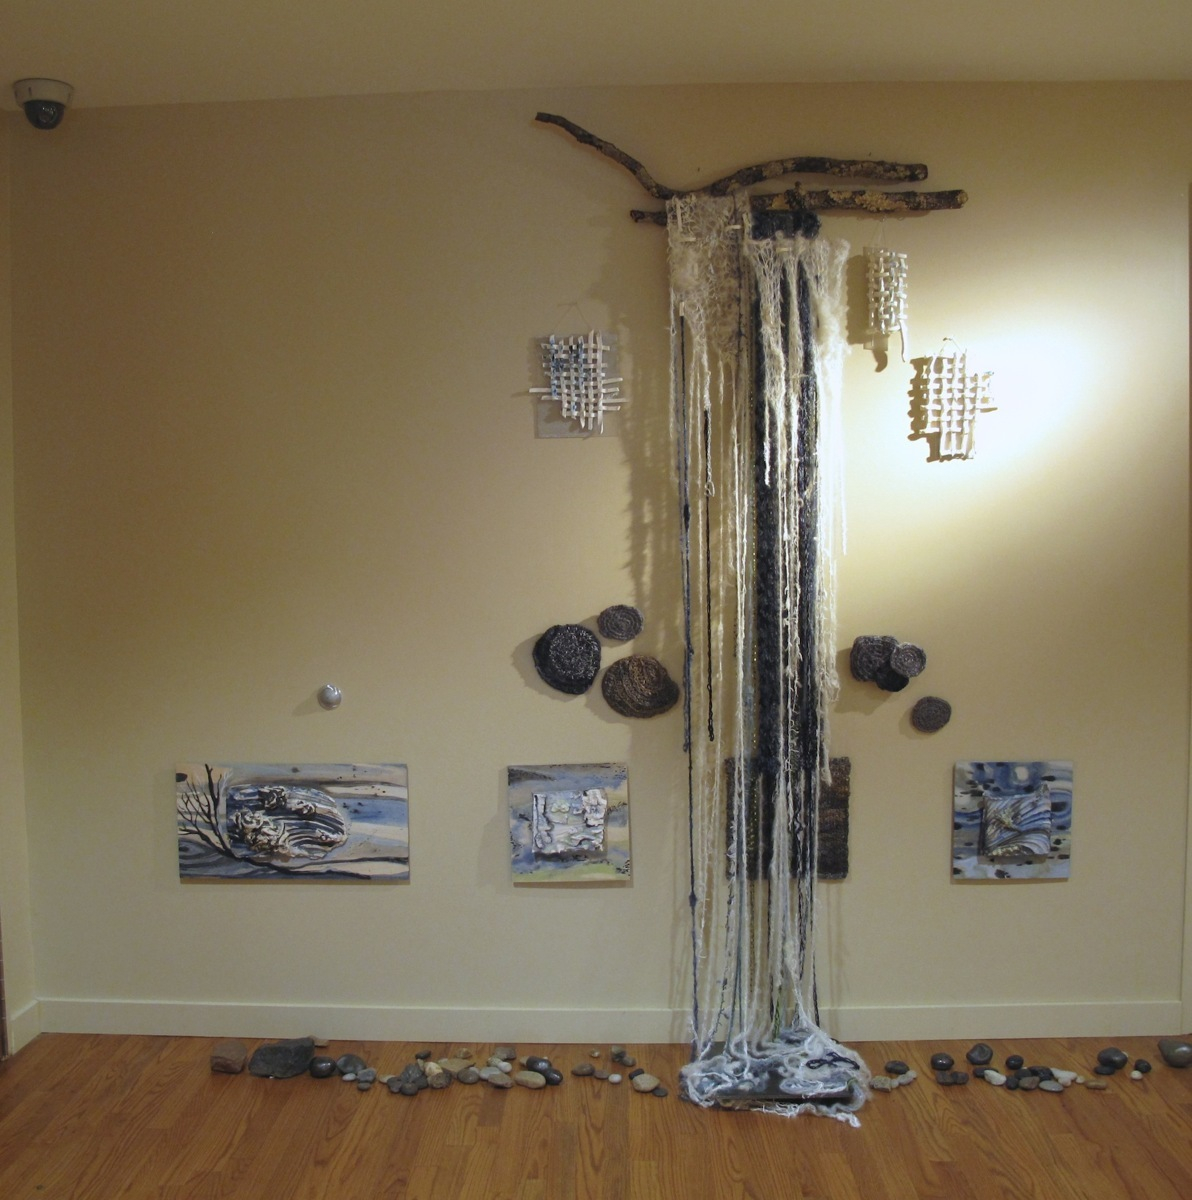 Waterfall detail, Solastalgia Installation, Room 1 (large view)